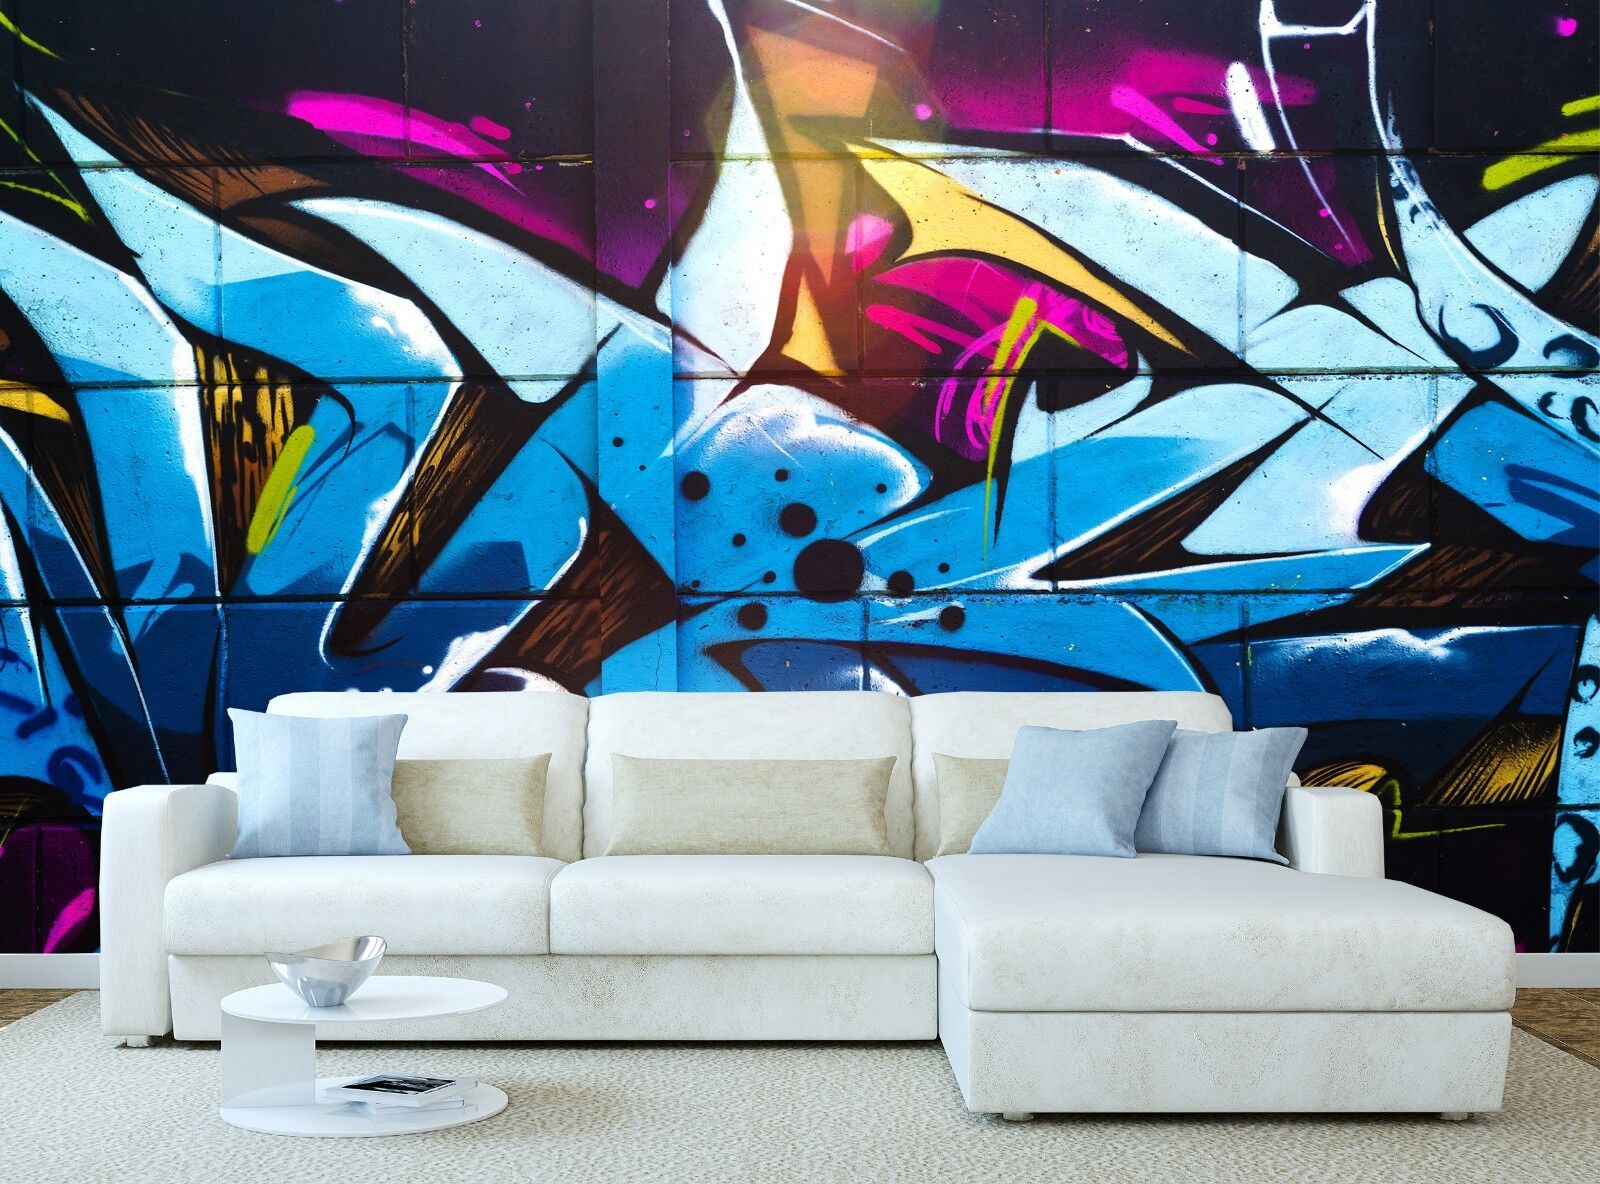 Street art Graffiti Photo Wallpaper Wall Mural DECOR Paper Poster Free Paste